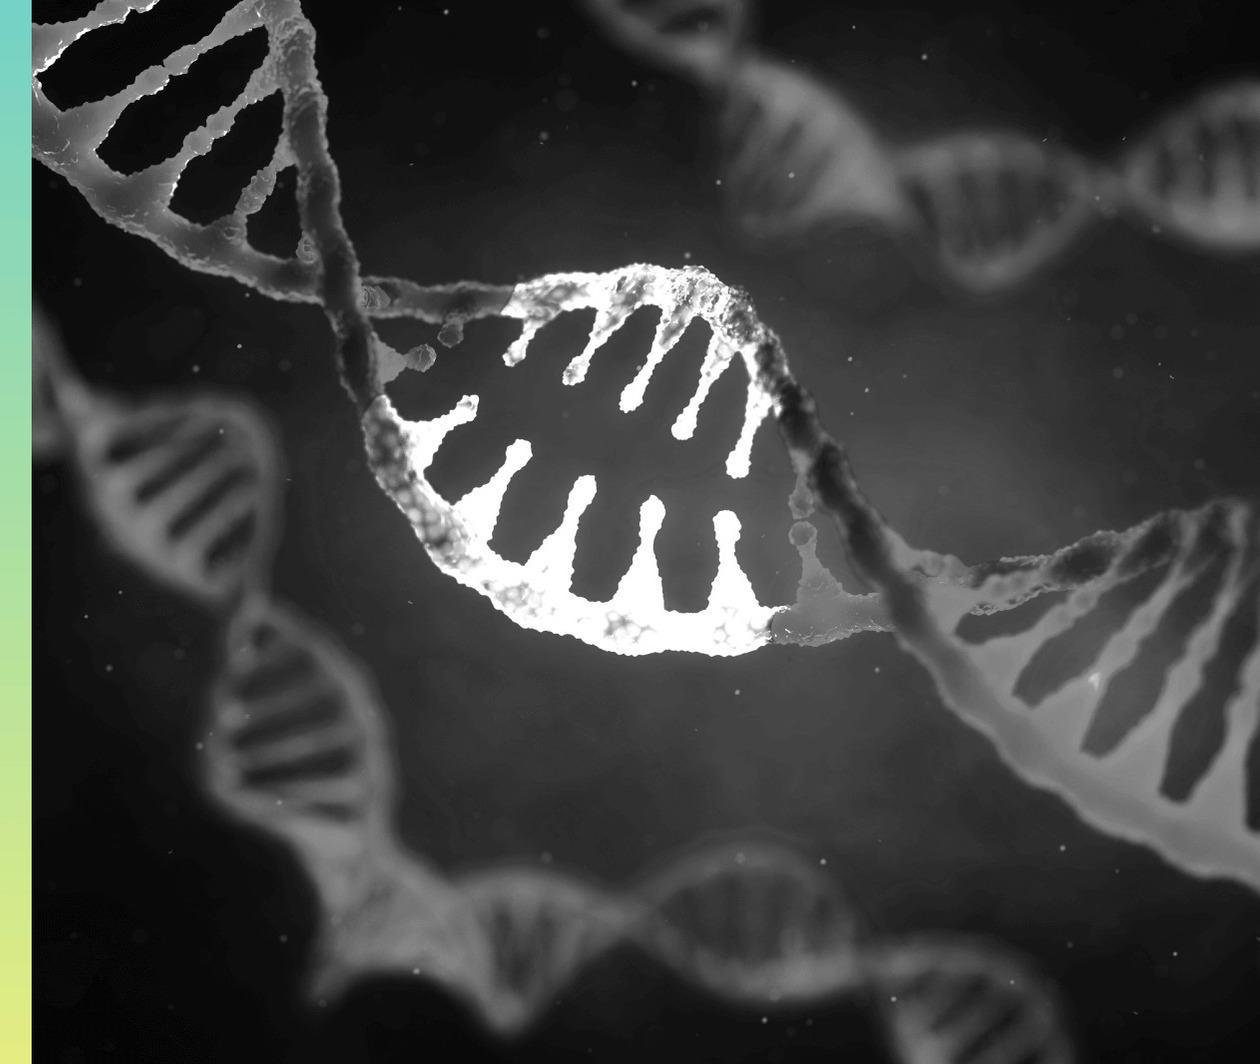 MedTech: Exploring the Human Genome